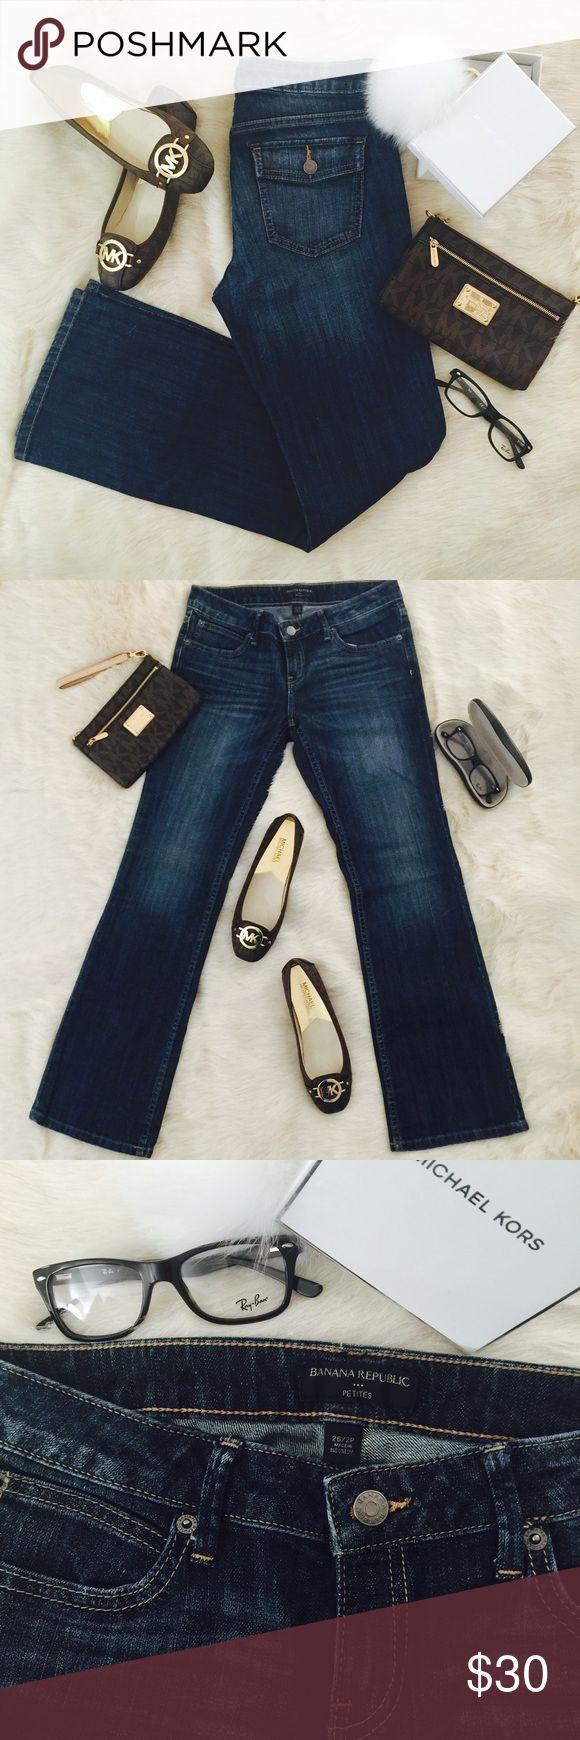 Banana Republic Flare Leg Jeans/Denim -Size: 26/2P Banana Republic Women's Flare Leg Jeans/Denim - Size: 26/2P. Like-new condition. Rarely worn.   #bananarepublic #denimjeans #jeans #fitandflare #nicejeans #denim Banana Republic Jeans Flare & Wide Leg